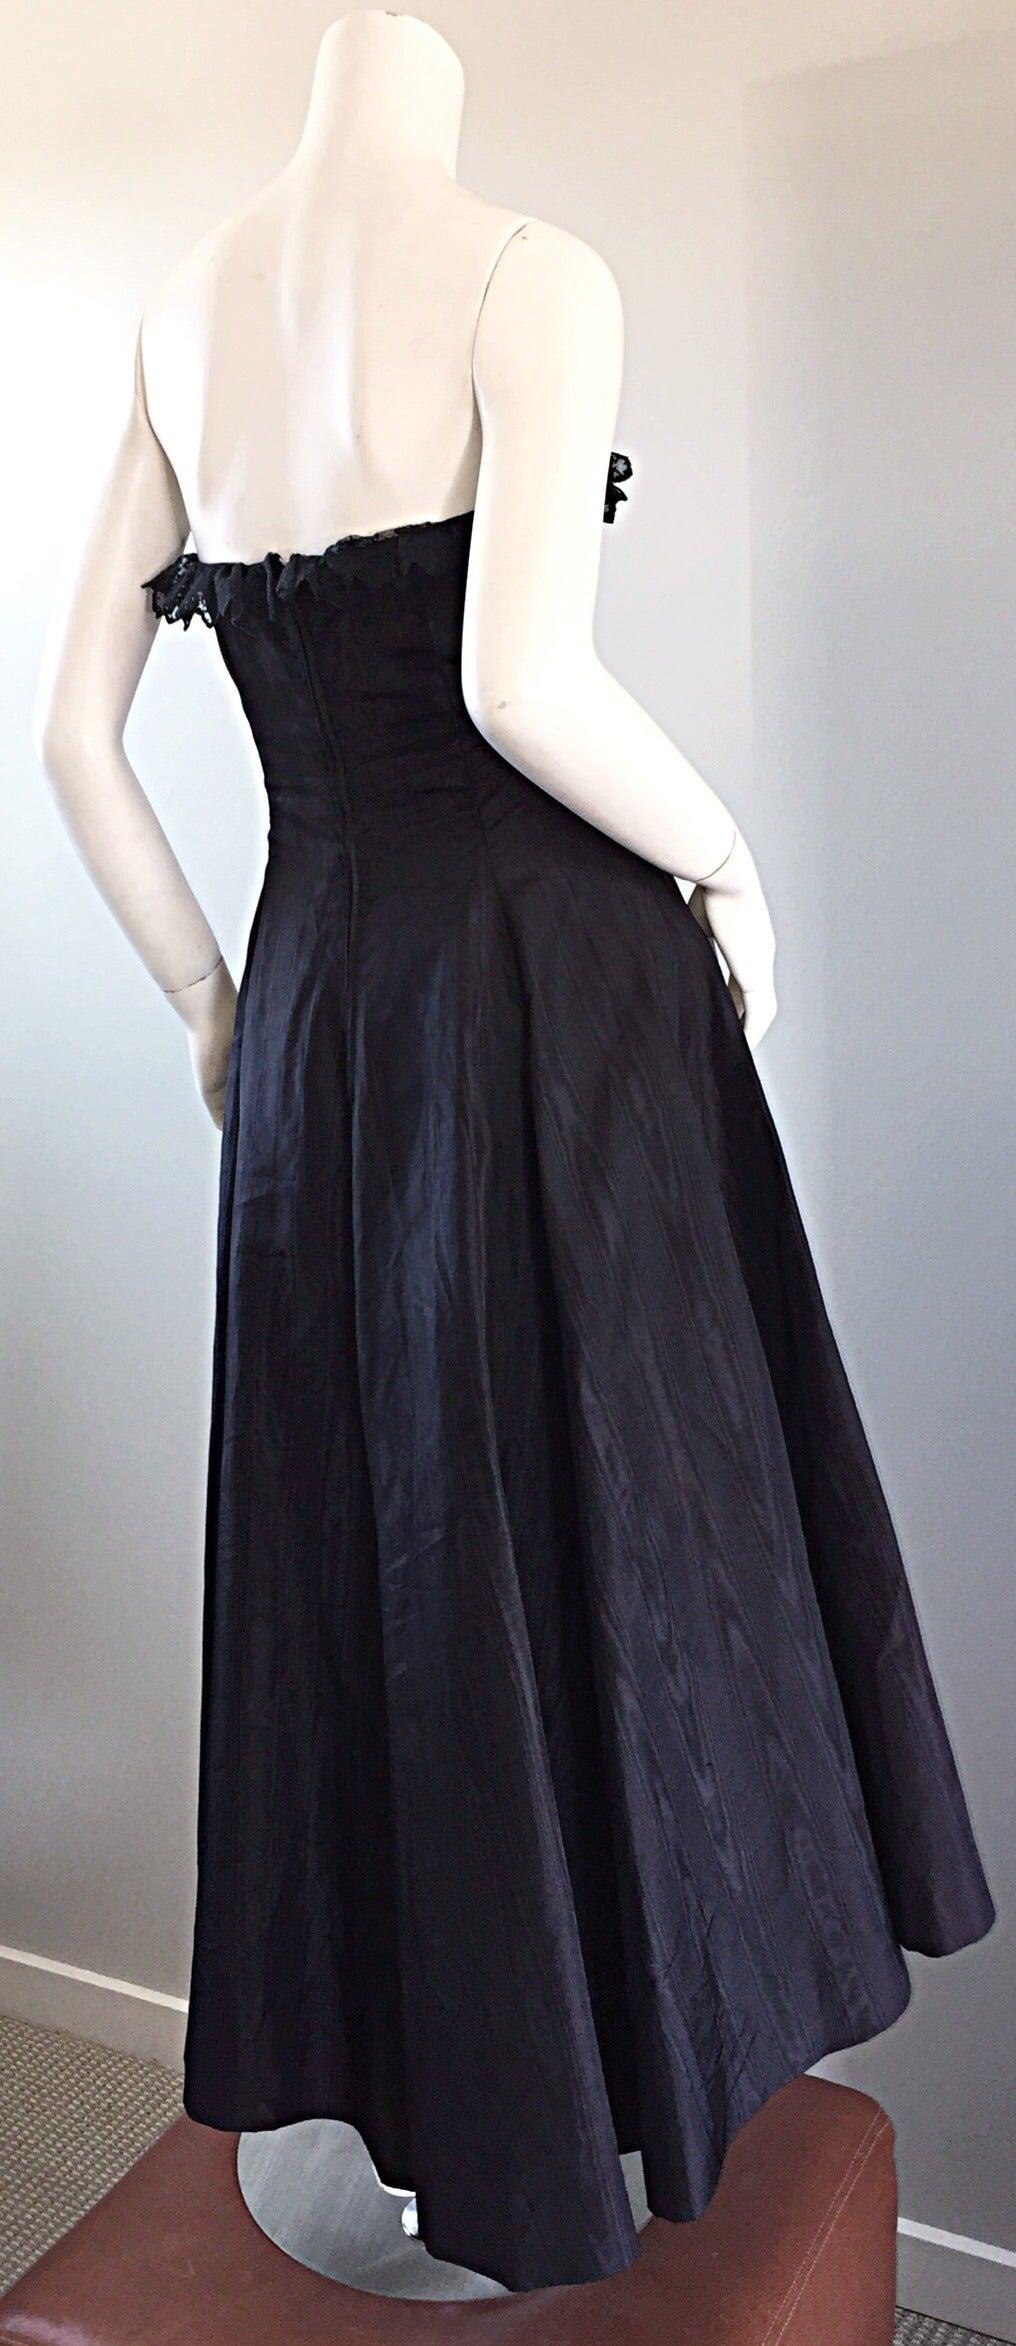 "Women's 1950s 50s Black Silk Taffeta + Lace Strapless "" New Look "" Vintage Dress For Sale"